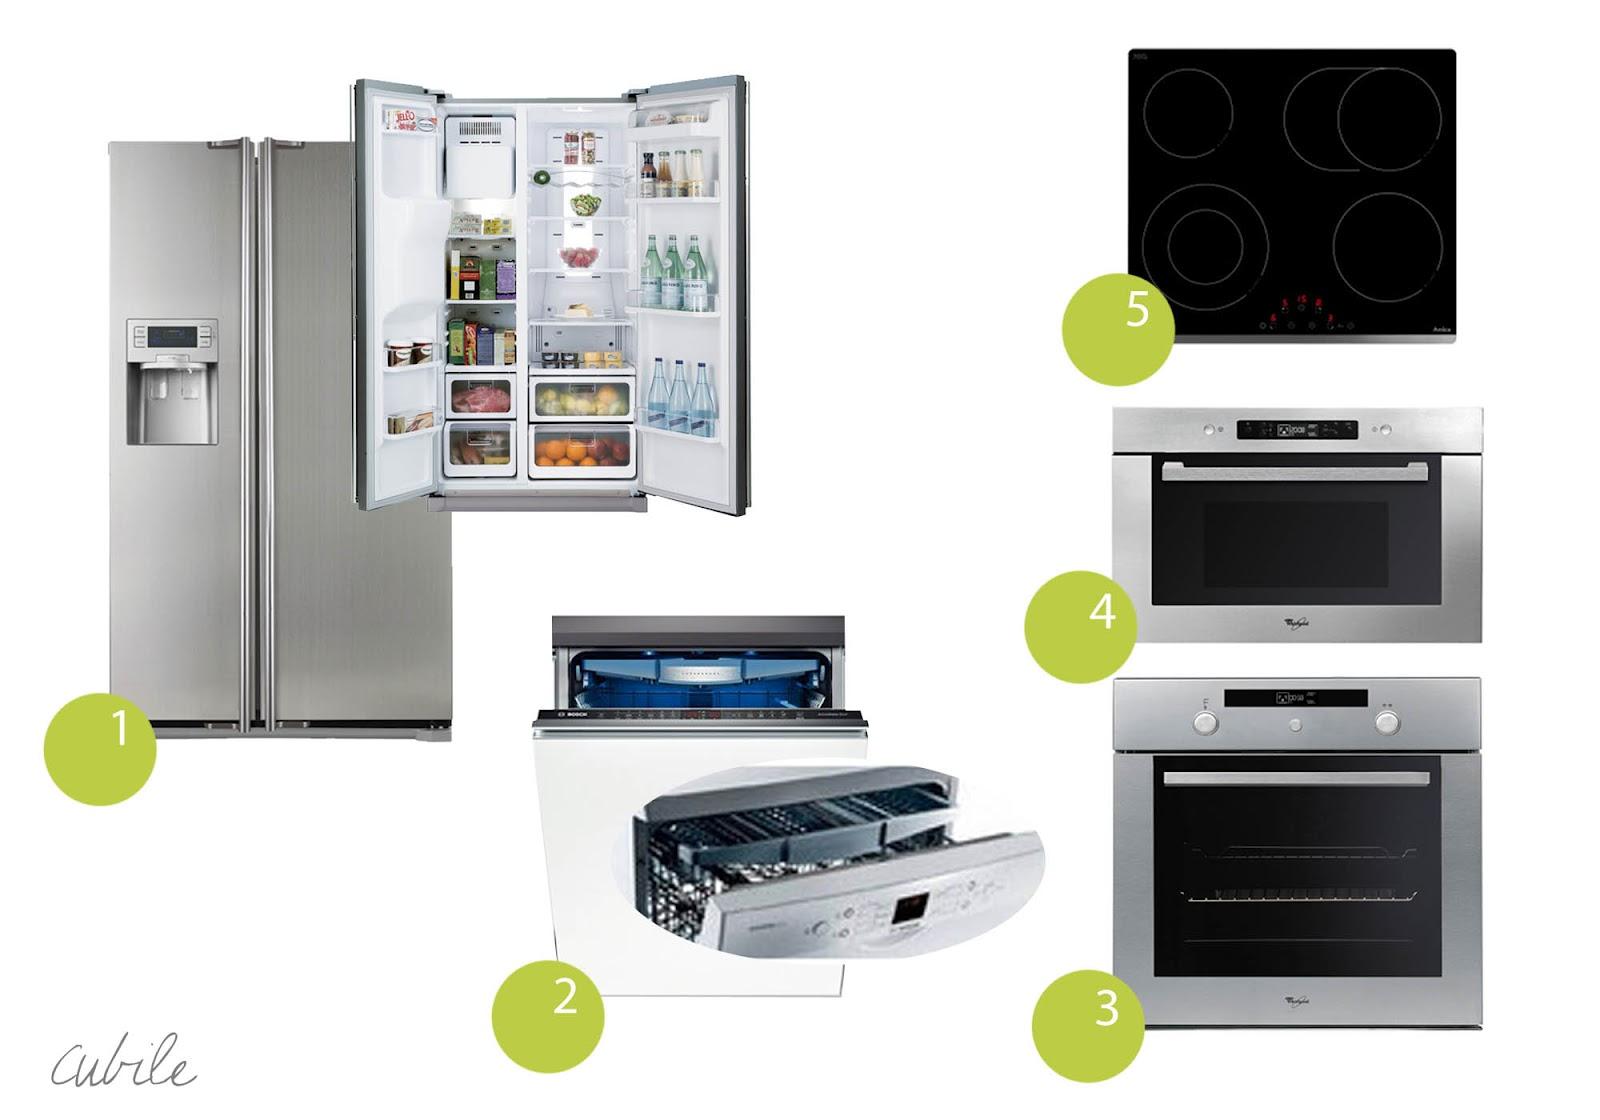 New Kitchen Appliances Ninja Brandsmart Appliance Packages